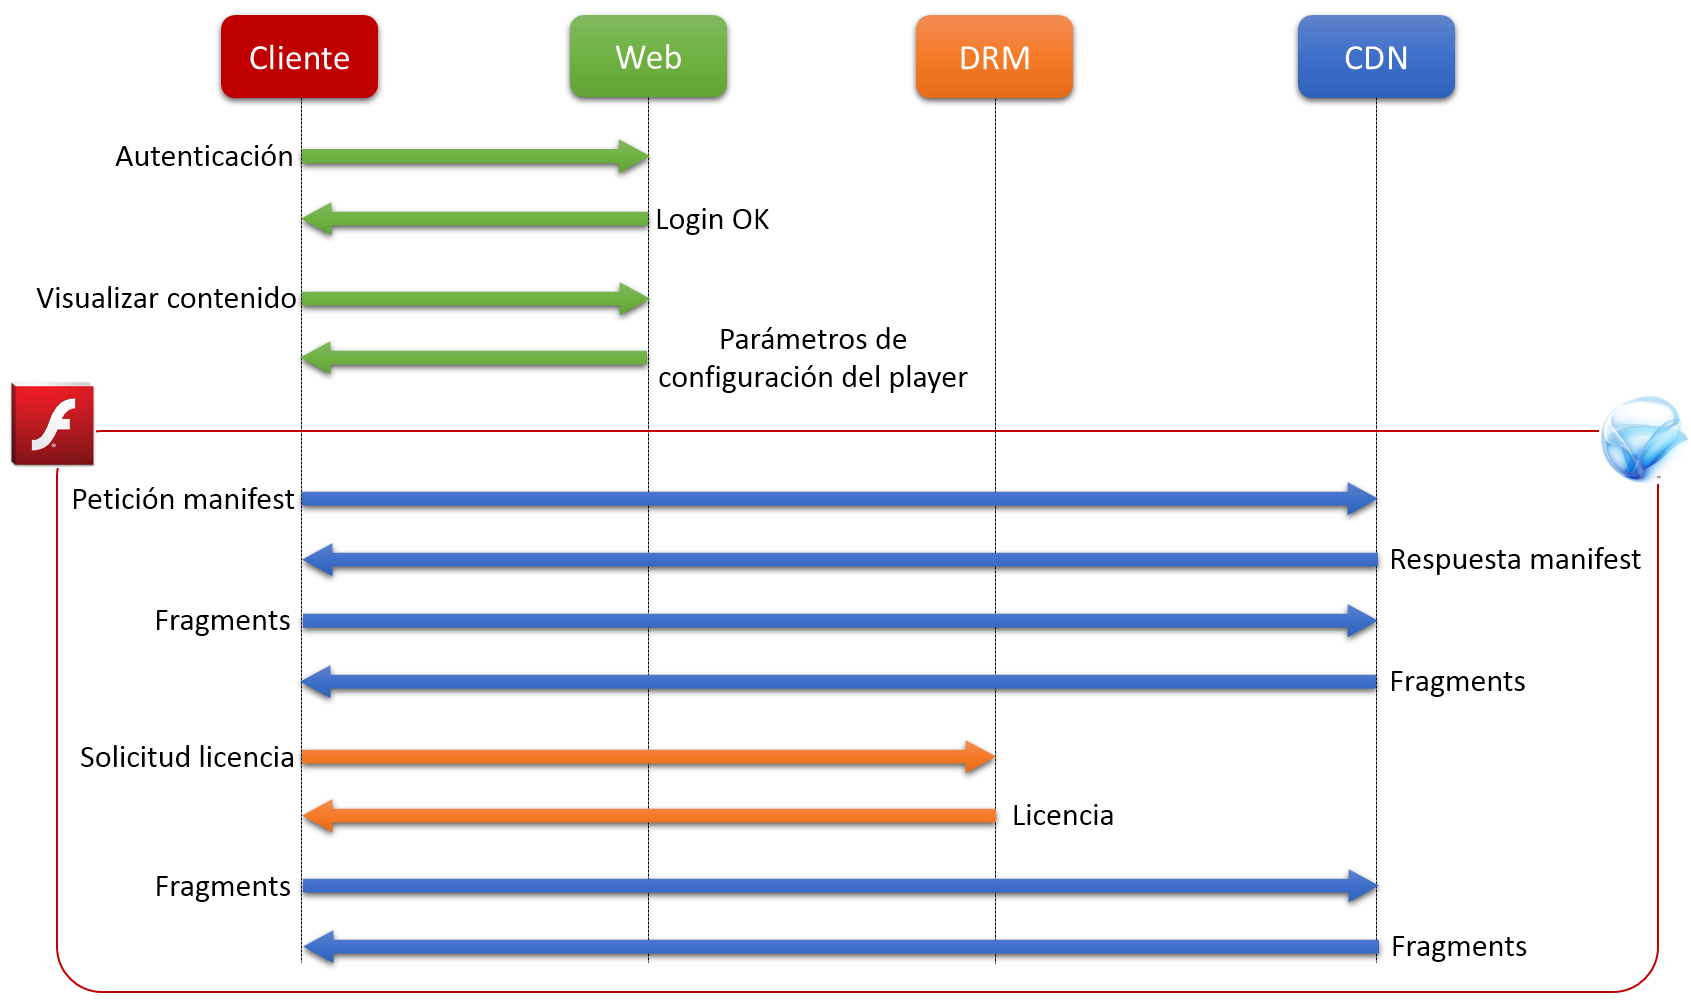 Secuencia operaciones OTT valida